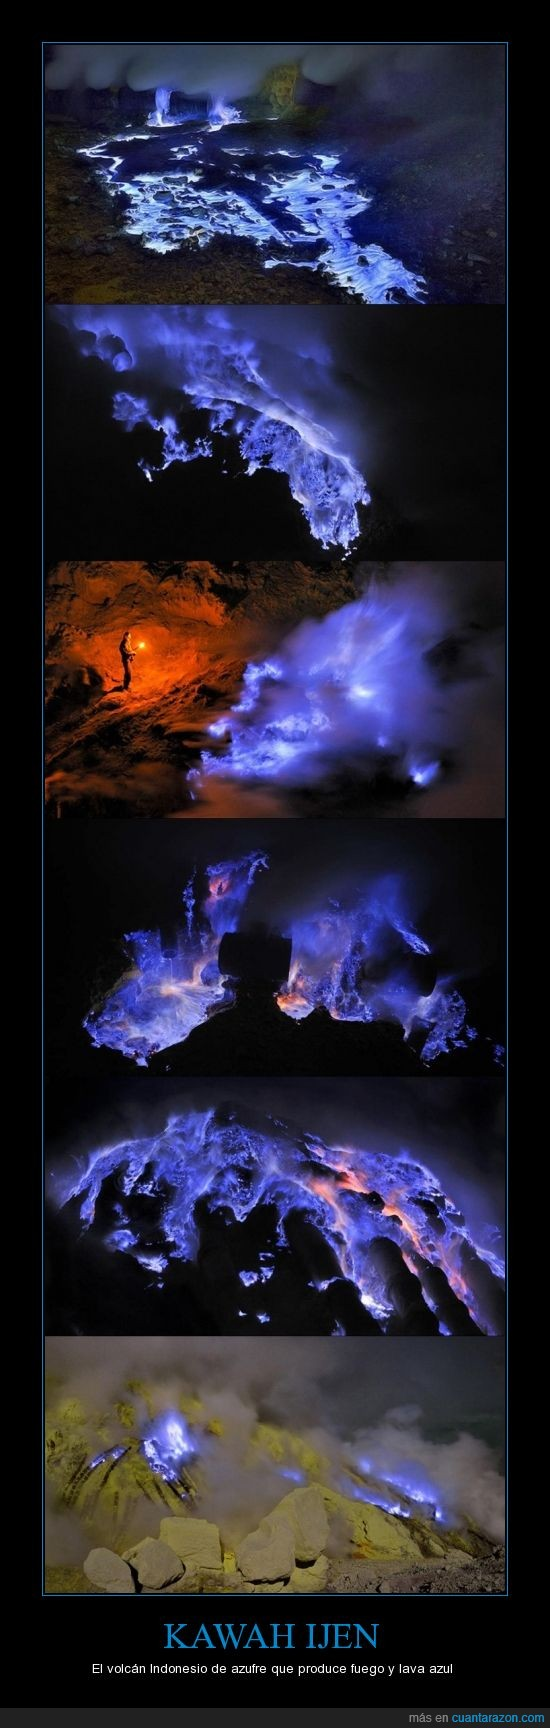 azufre,azul,extraño,fuego,Indonesia,kawah Ijen,lava,luz,mineral,volcán